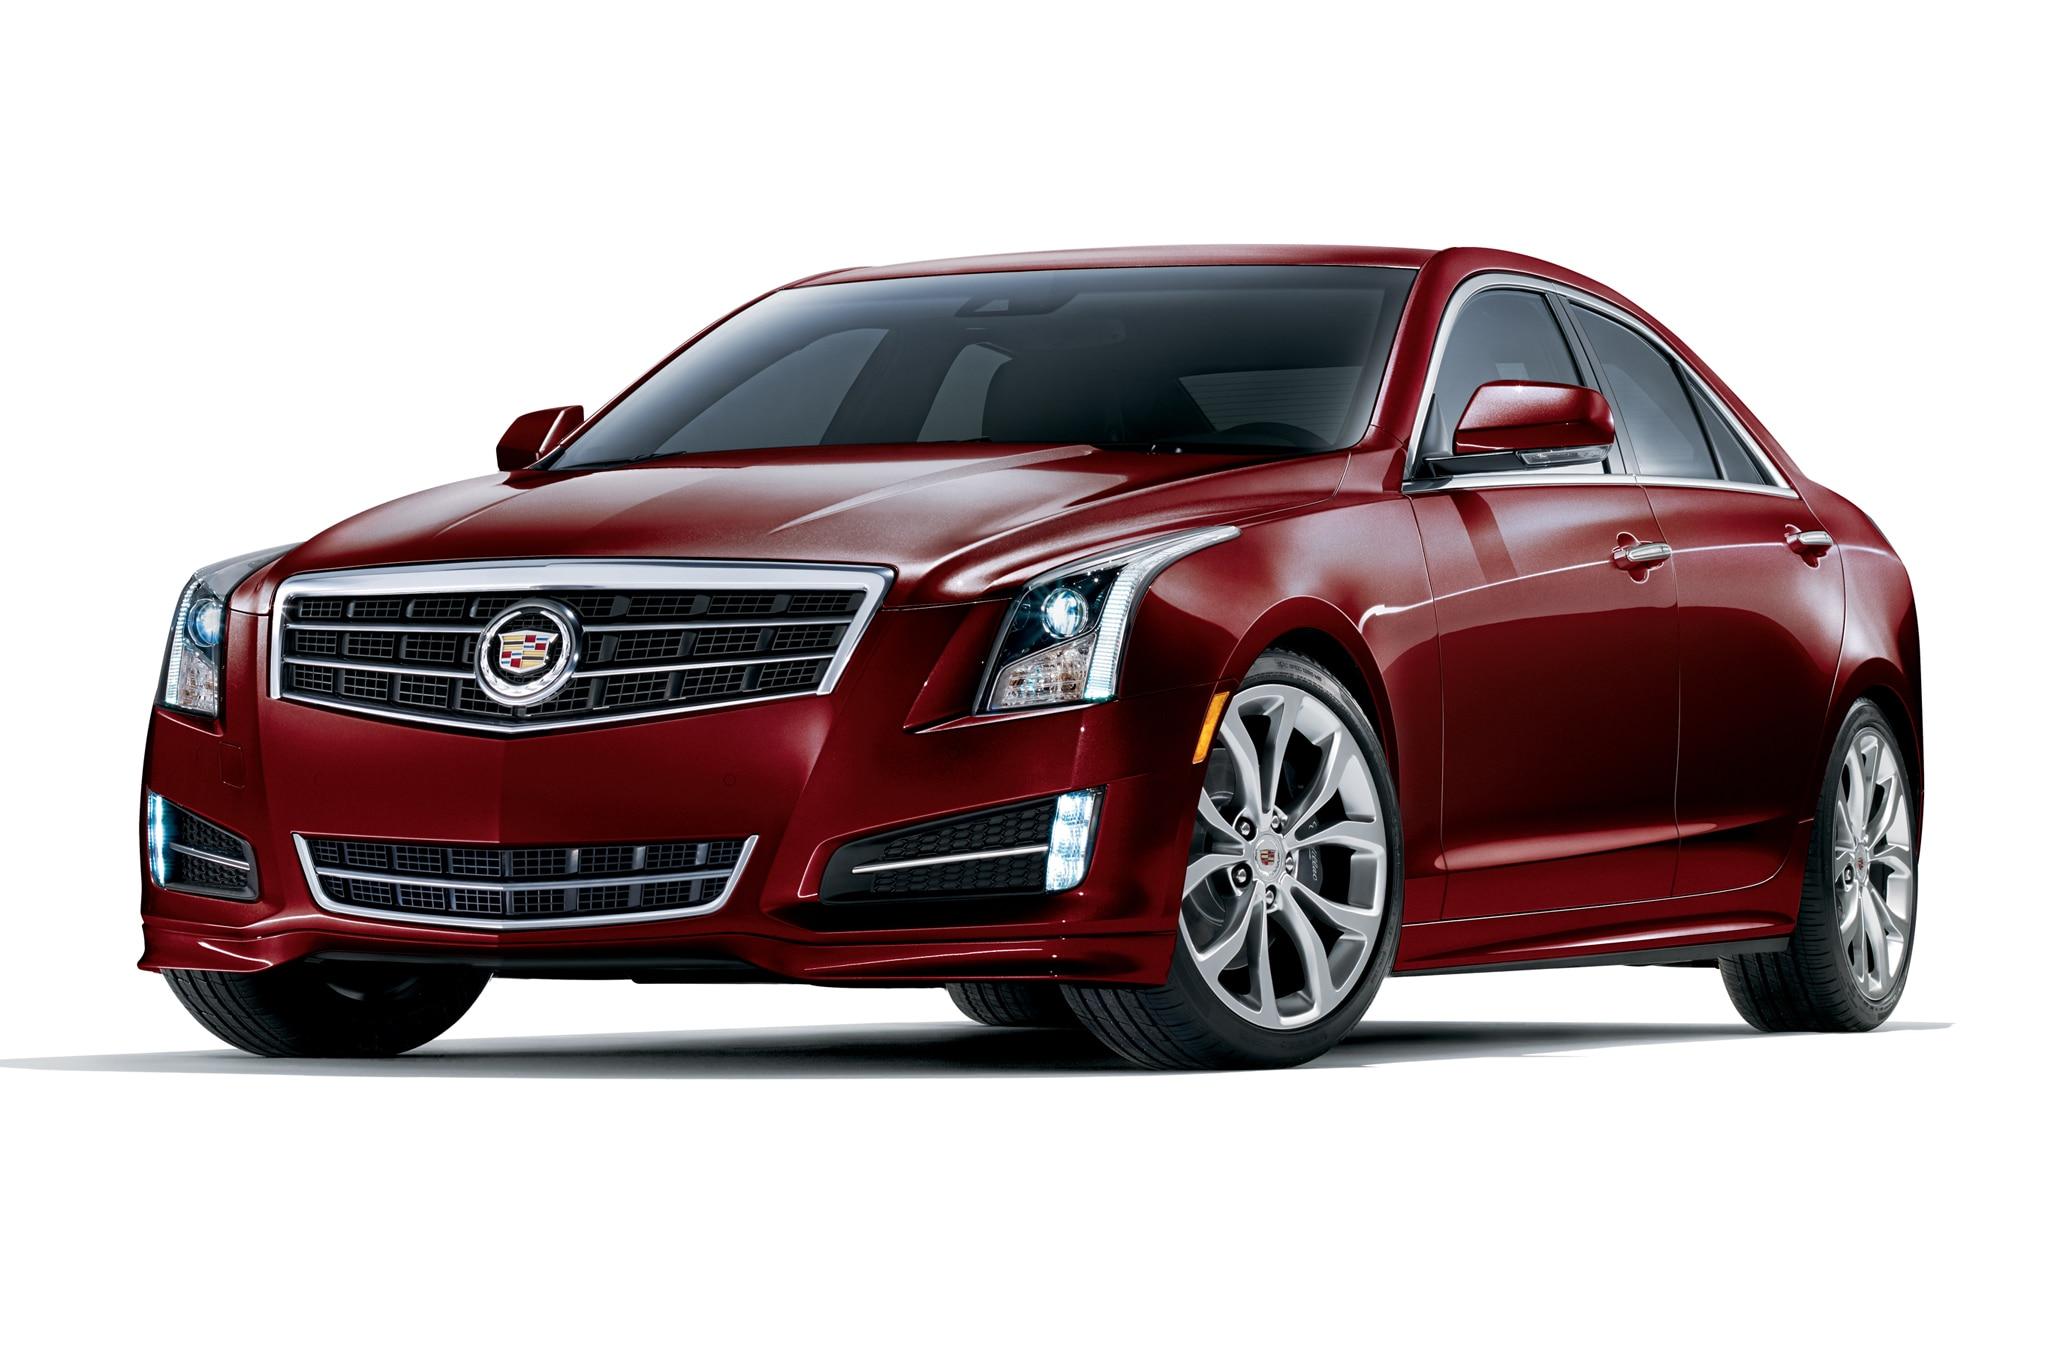 2014 Cadillac Ats Crimson Sport Edition Front Three Quarters1